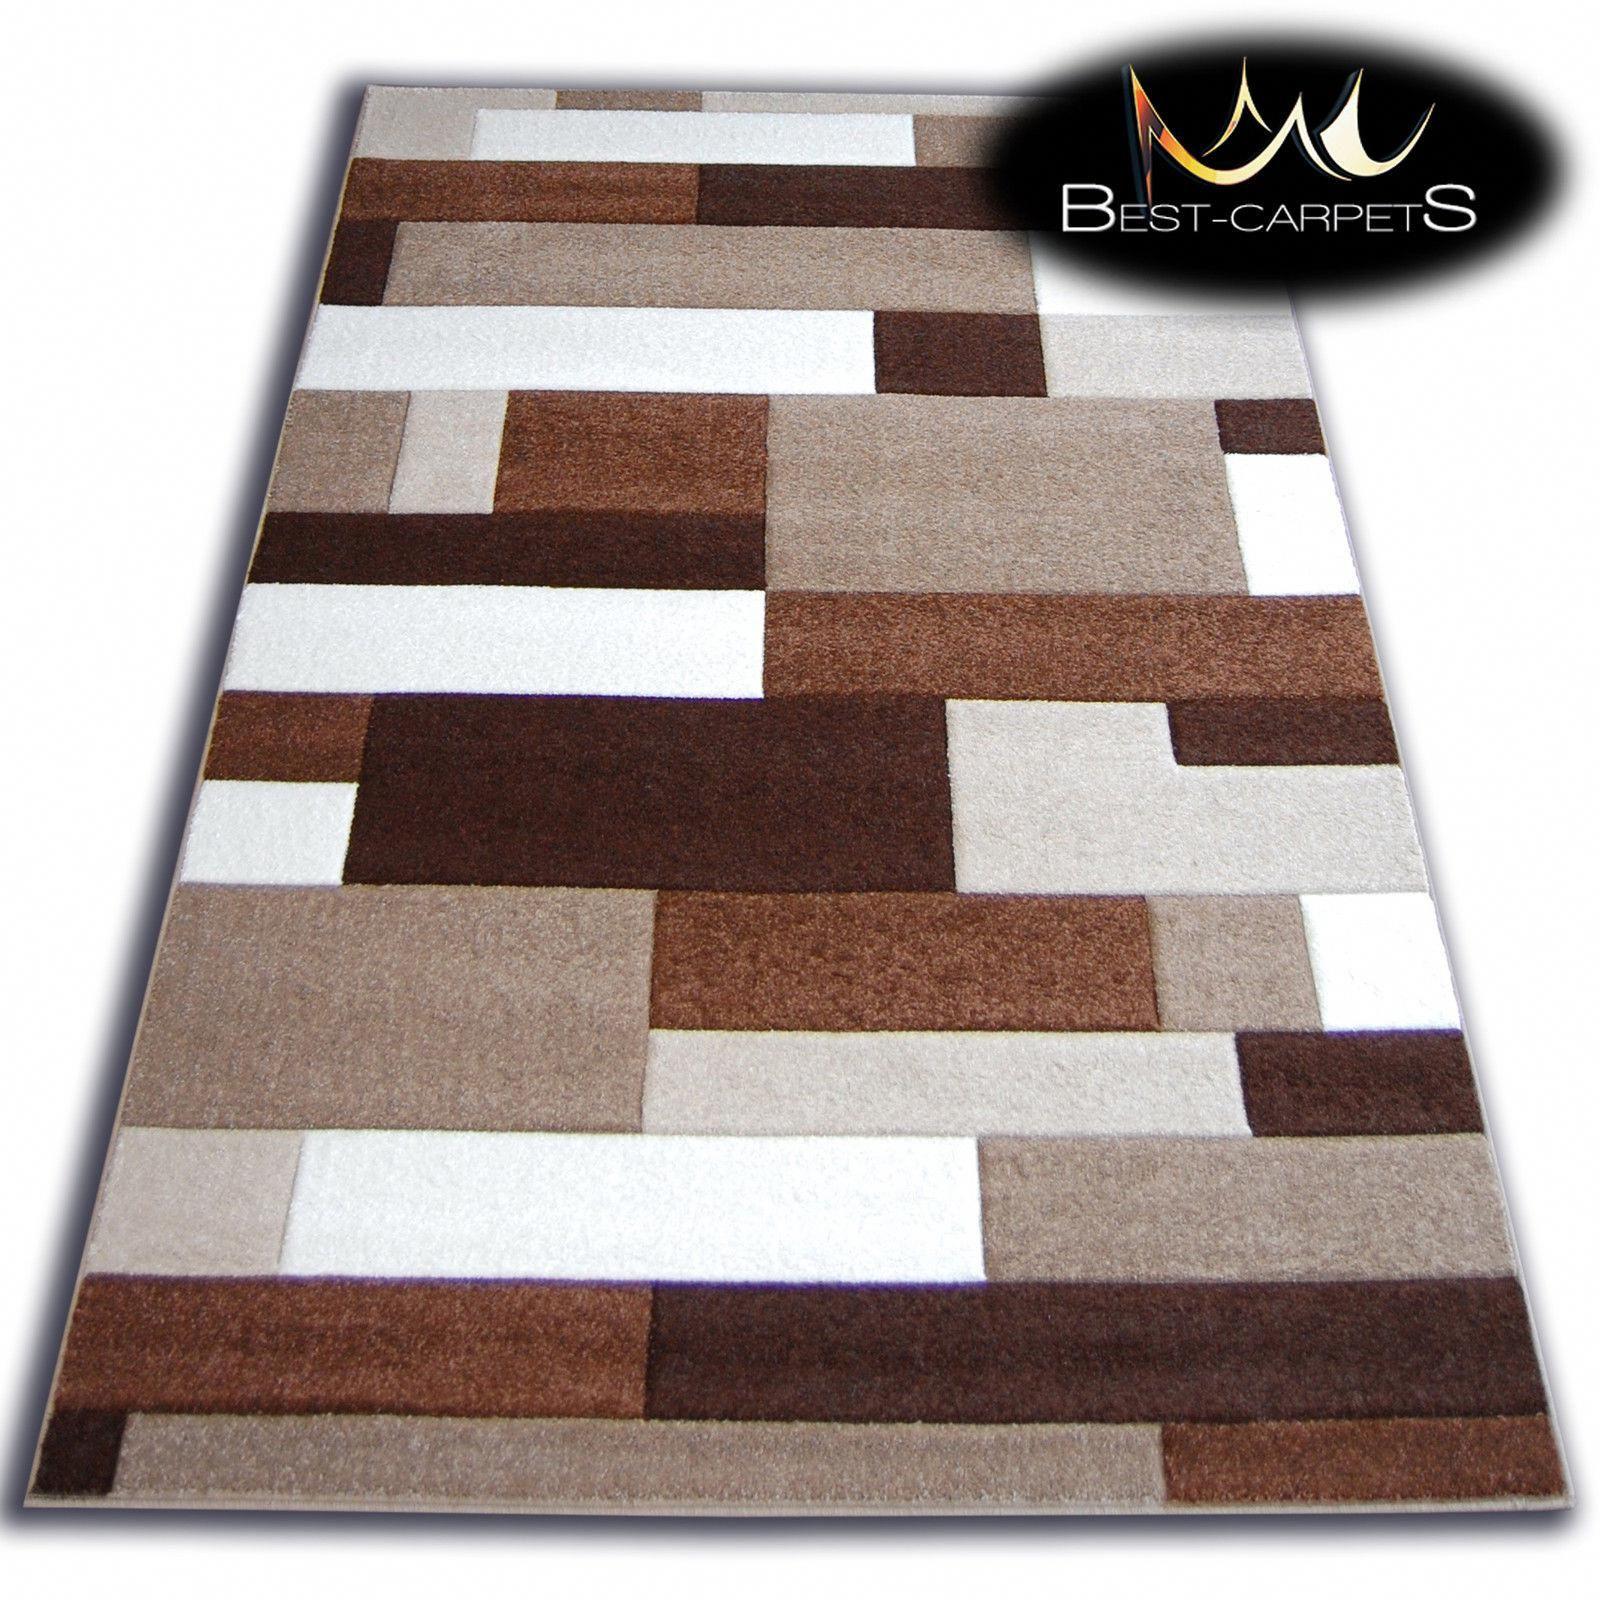 Best-Carpets.co.uk Area Rugs & Mats #eBay Home, Furniture & DIY #BuyCarpetsOnline